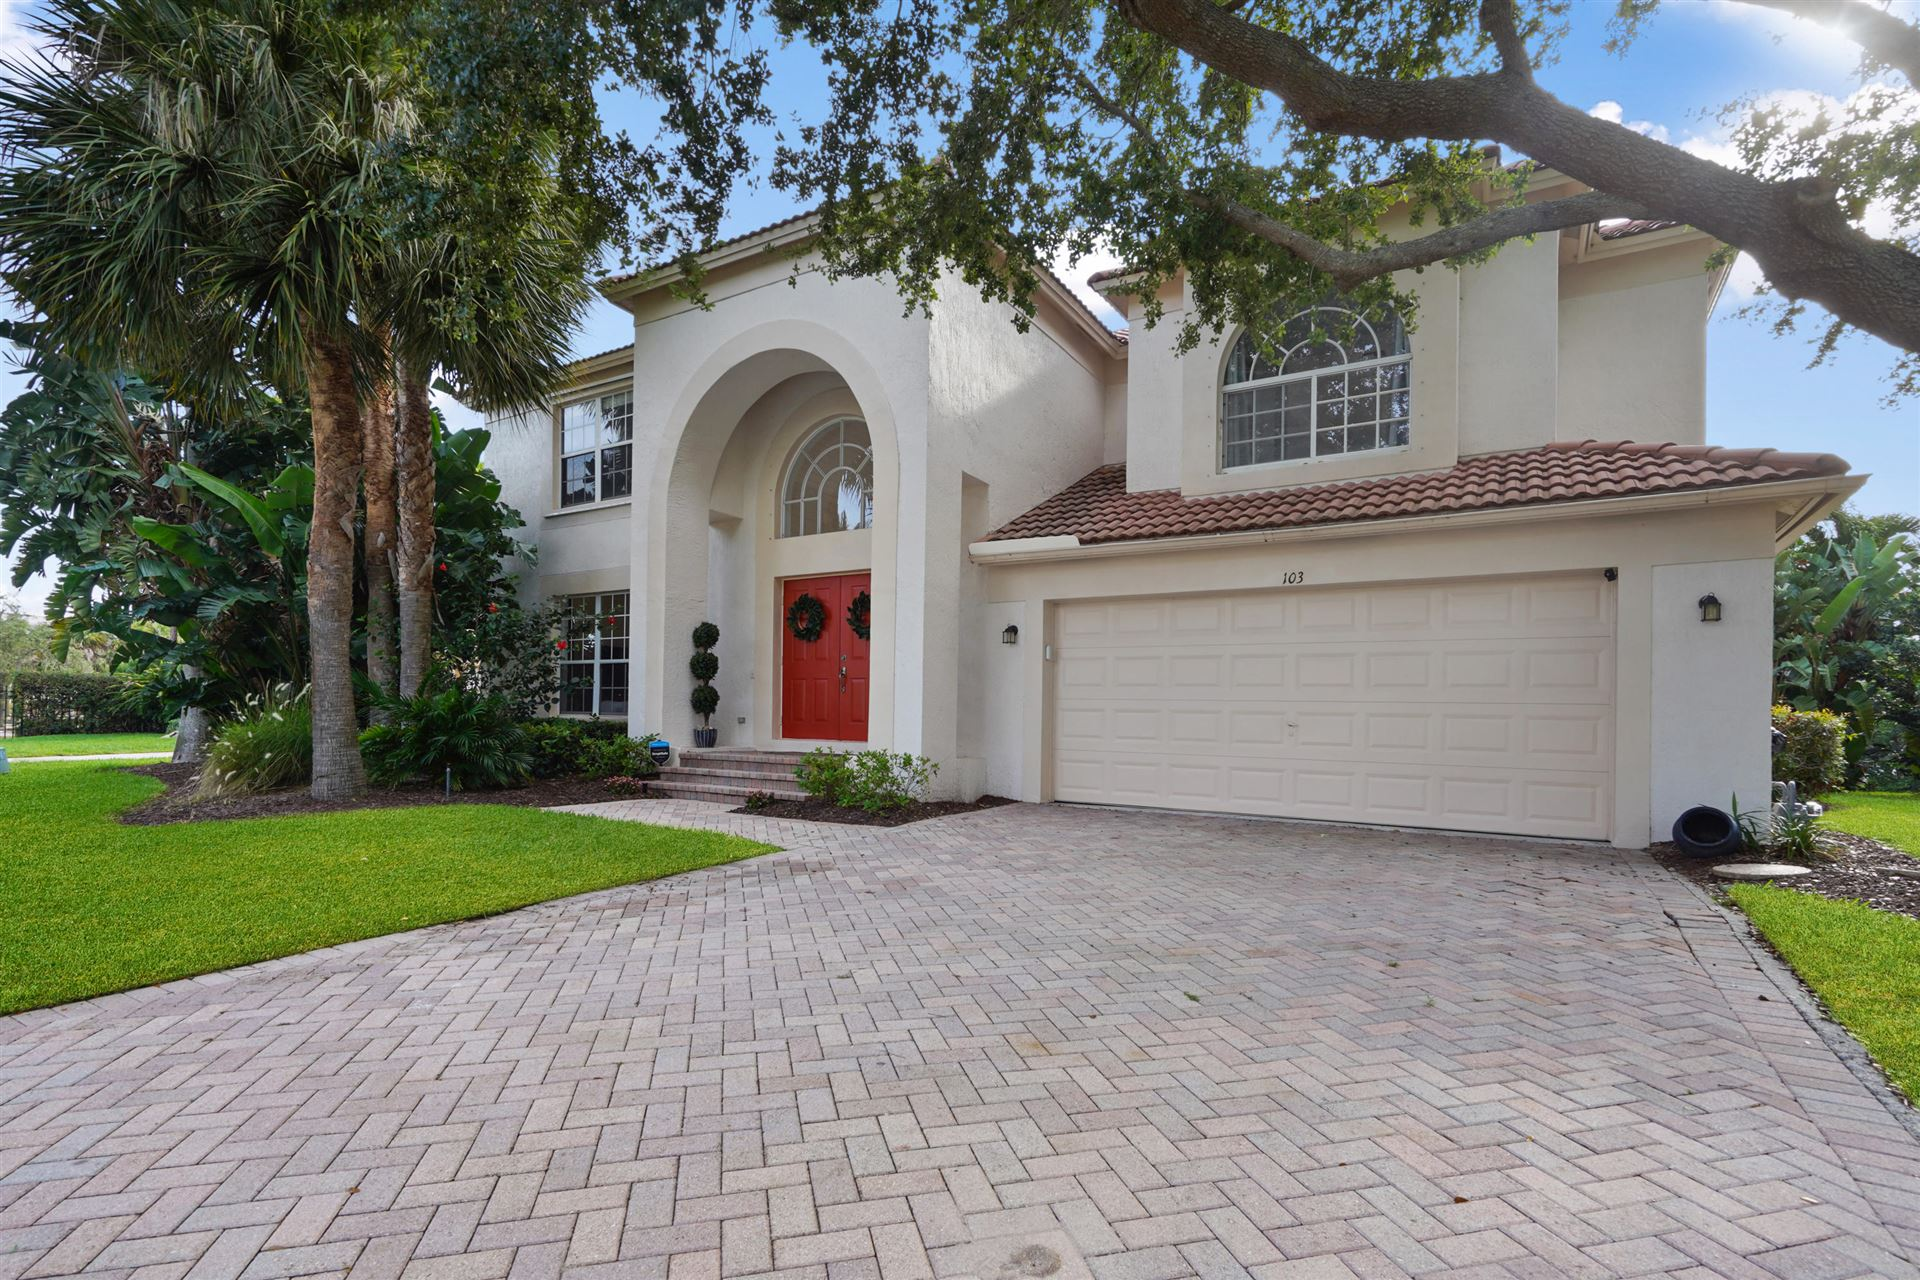 Photo of 103 Lone Pine Lane, Palm Beach Gardens, FL 33410 (MLS # RX-10726263)